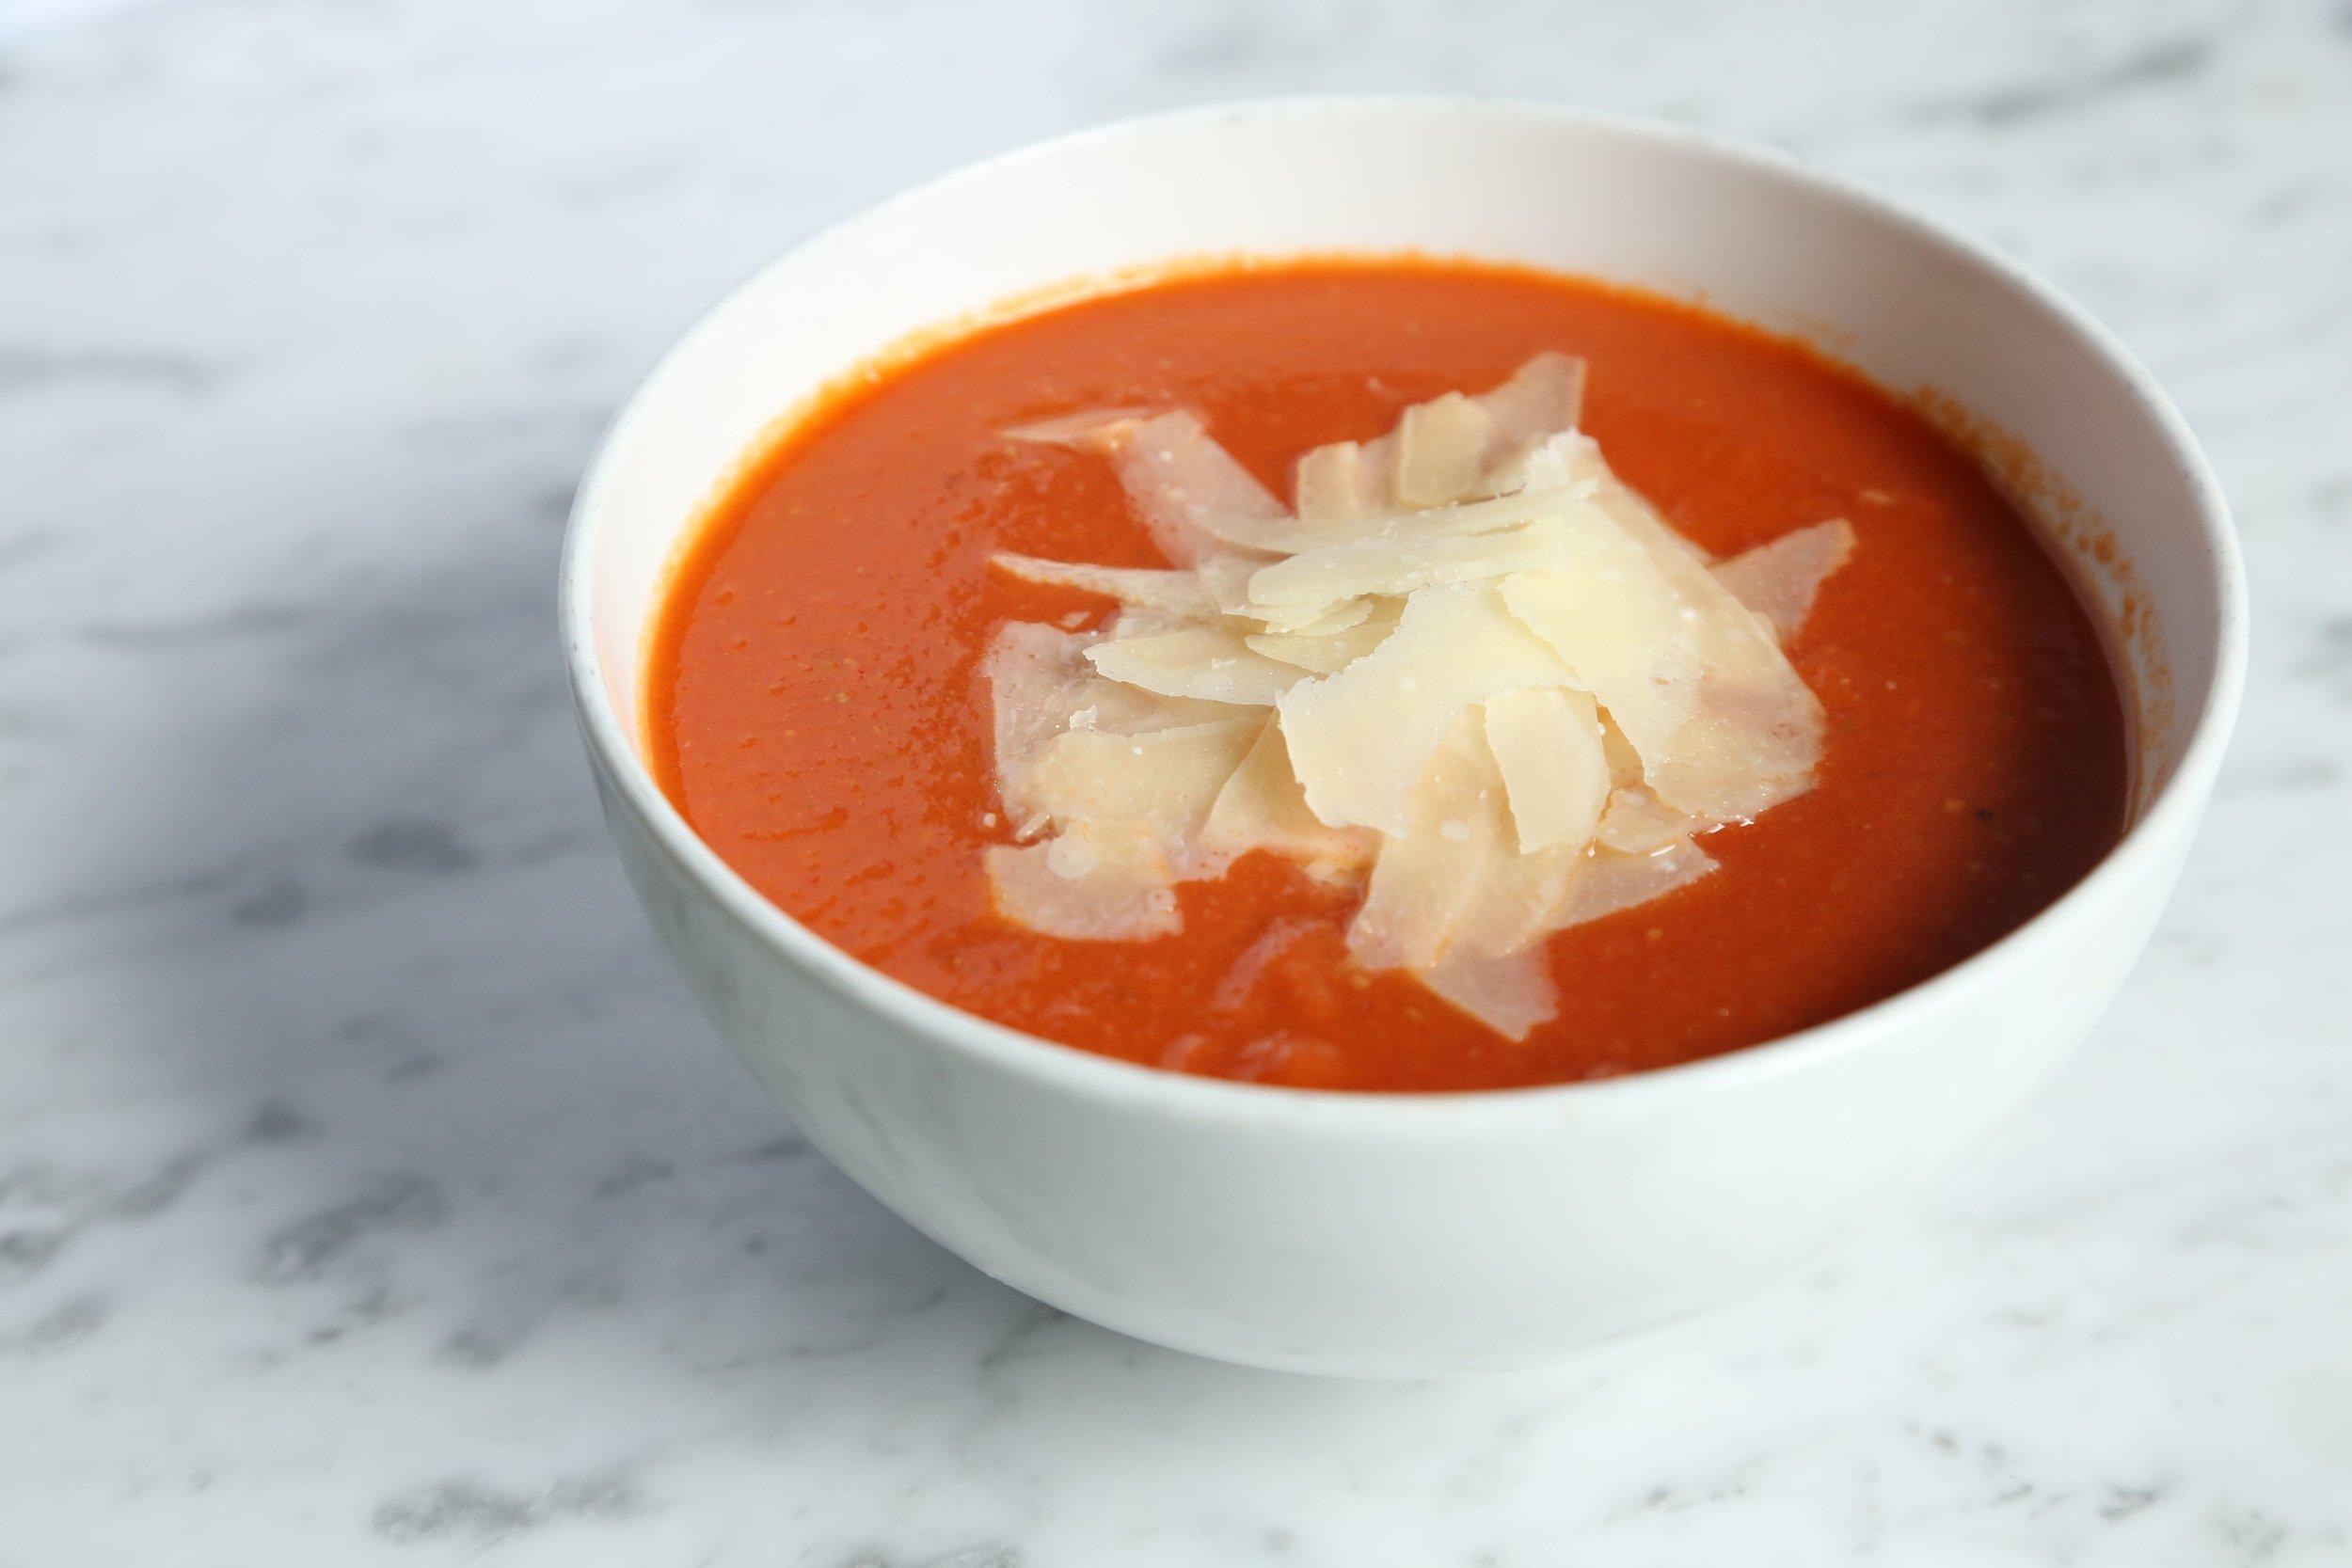 Tomato parmesan reggiano soup